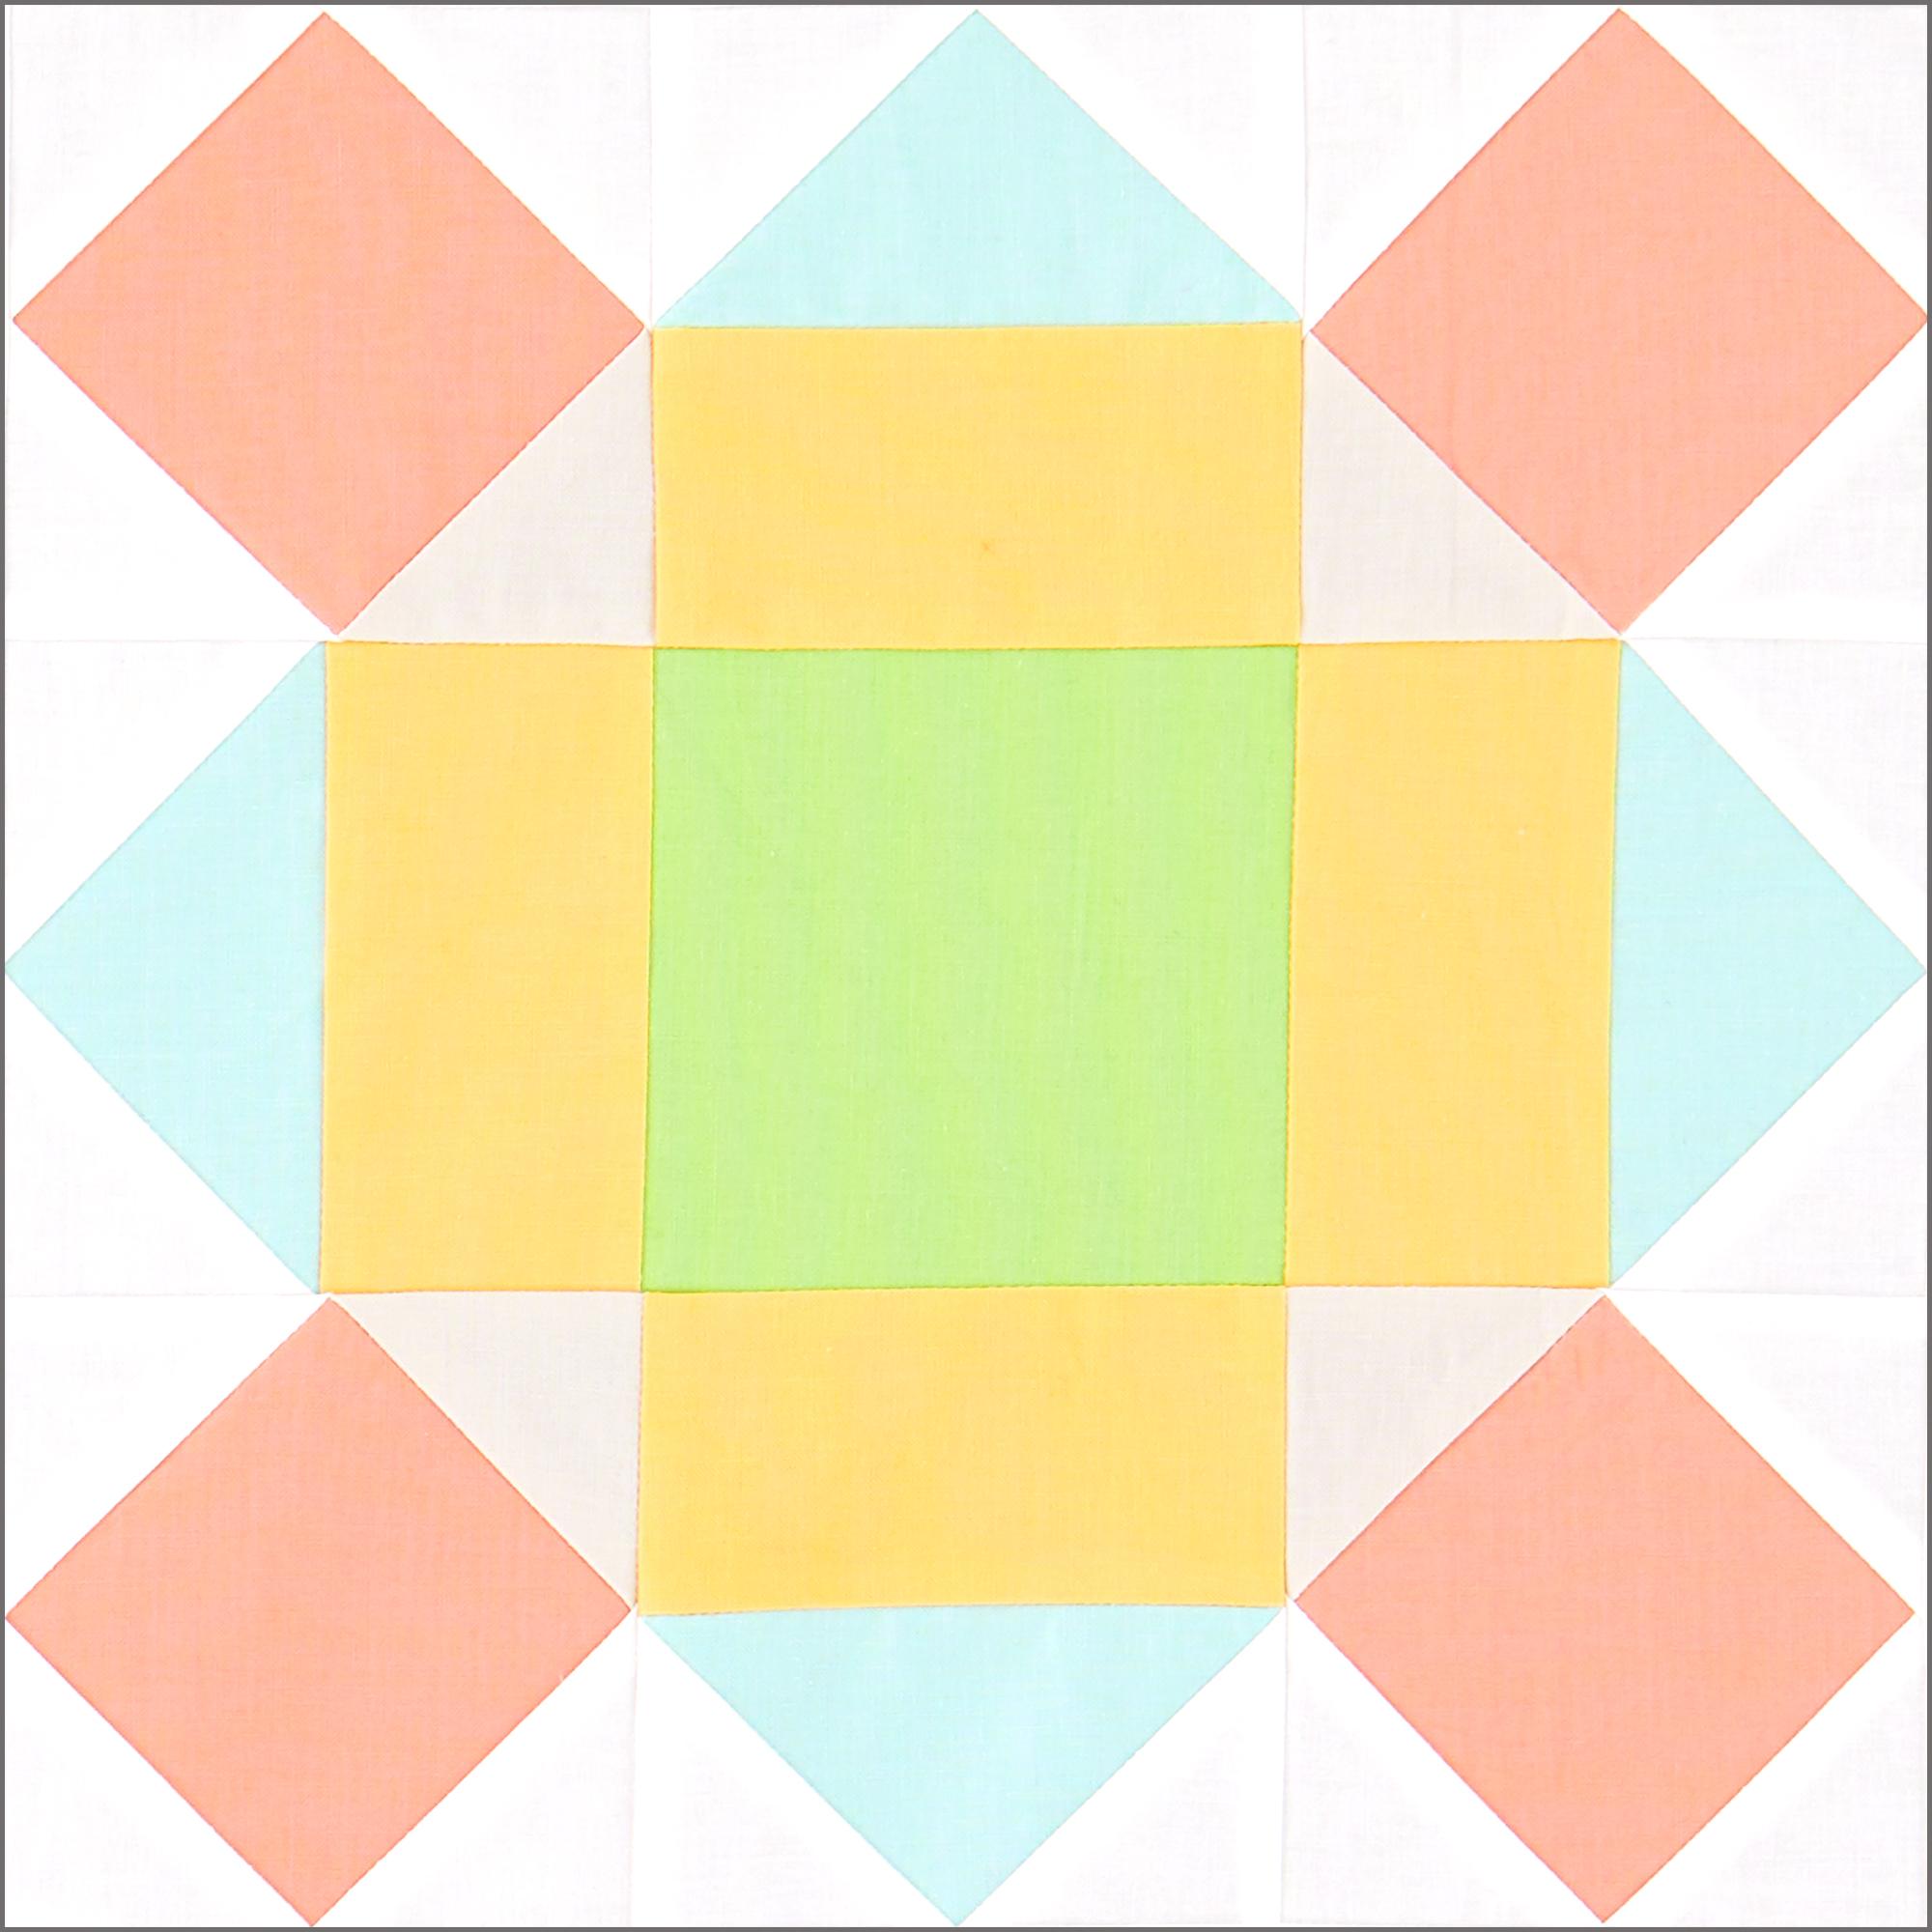 Block made of pink, aqua, yellow, and green squares